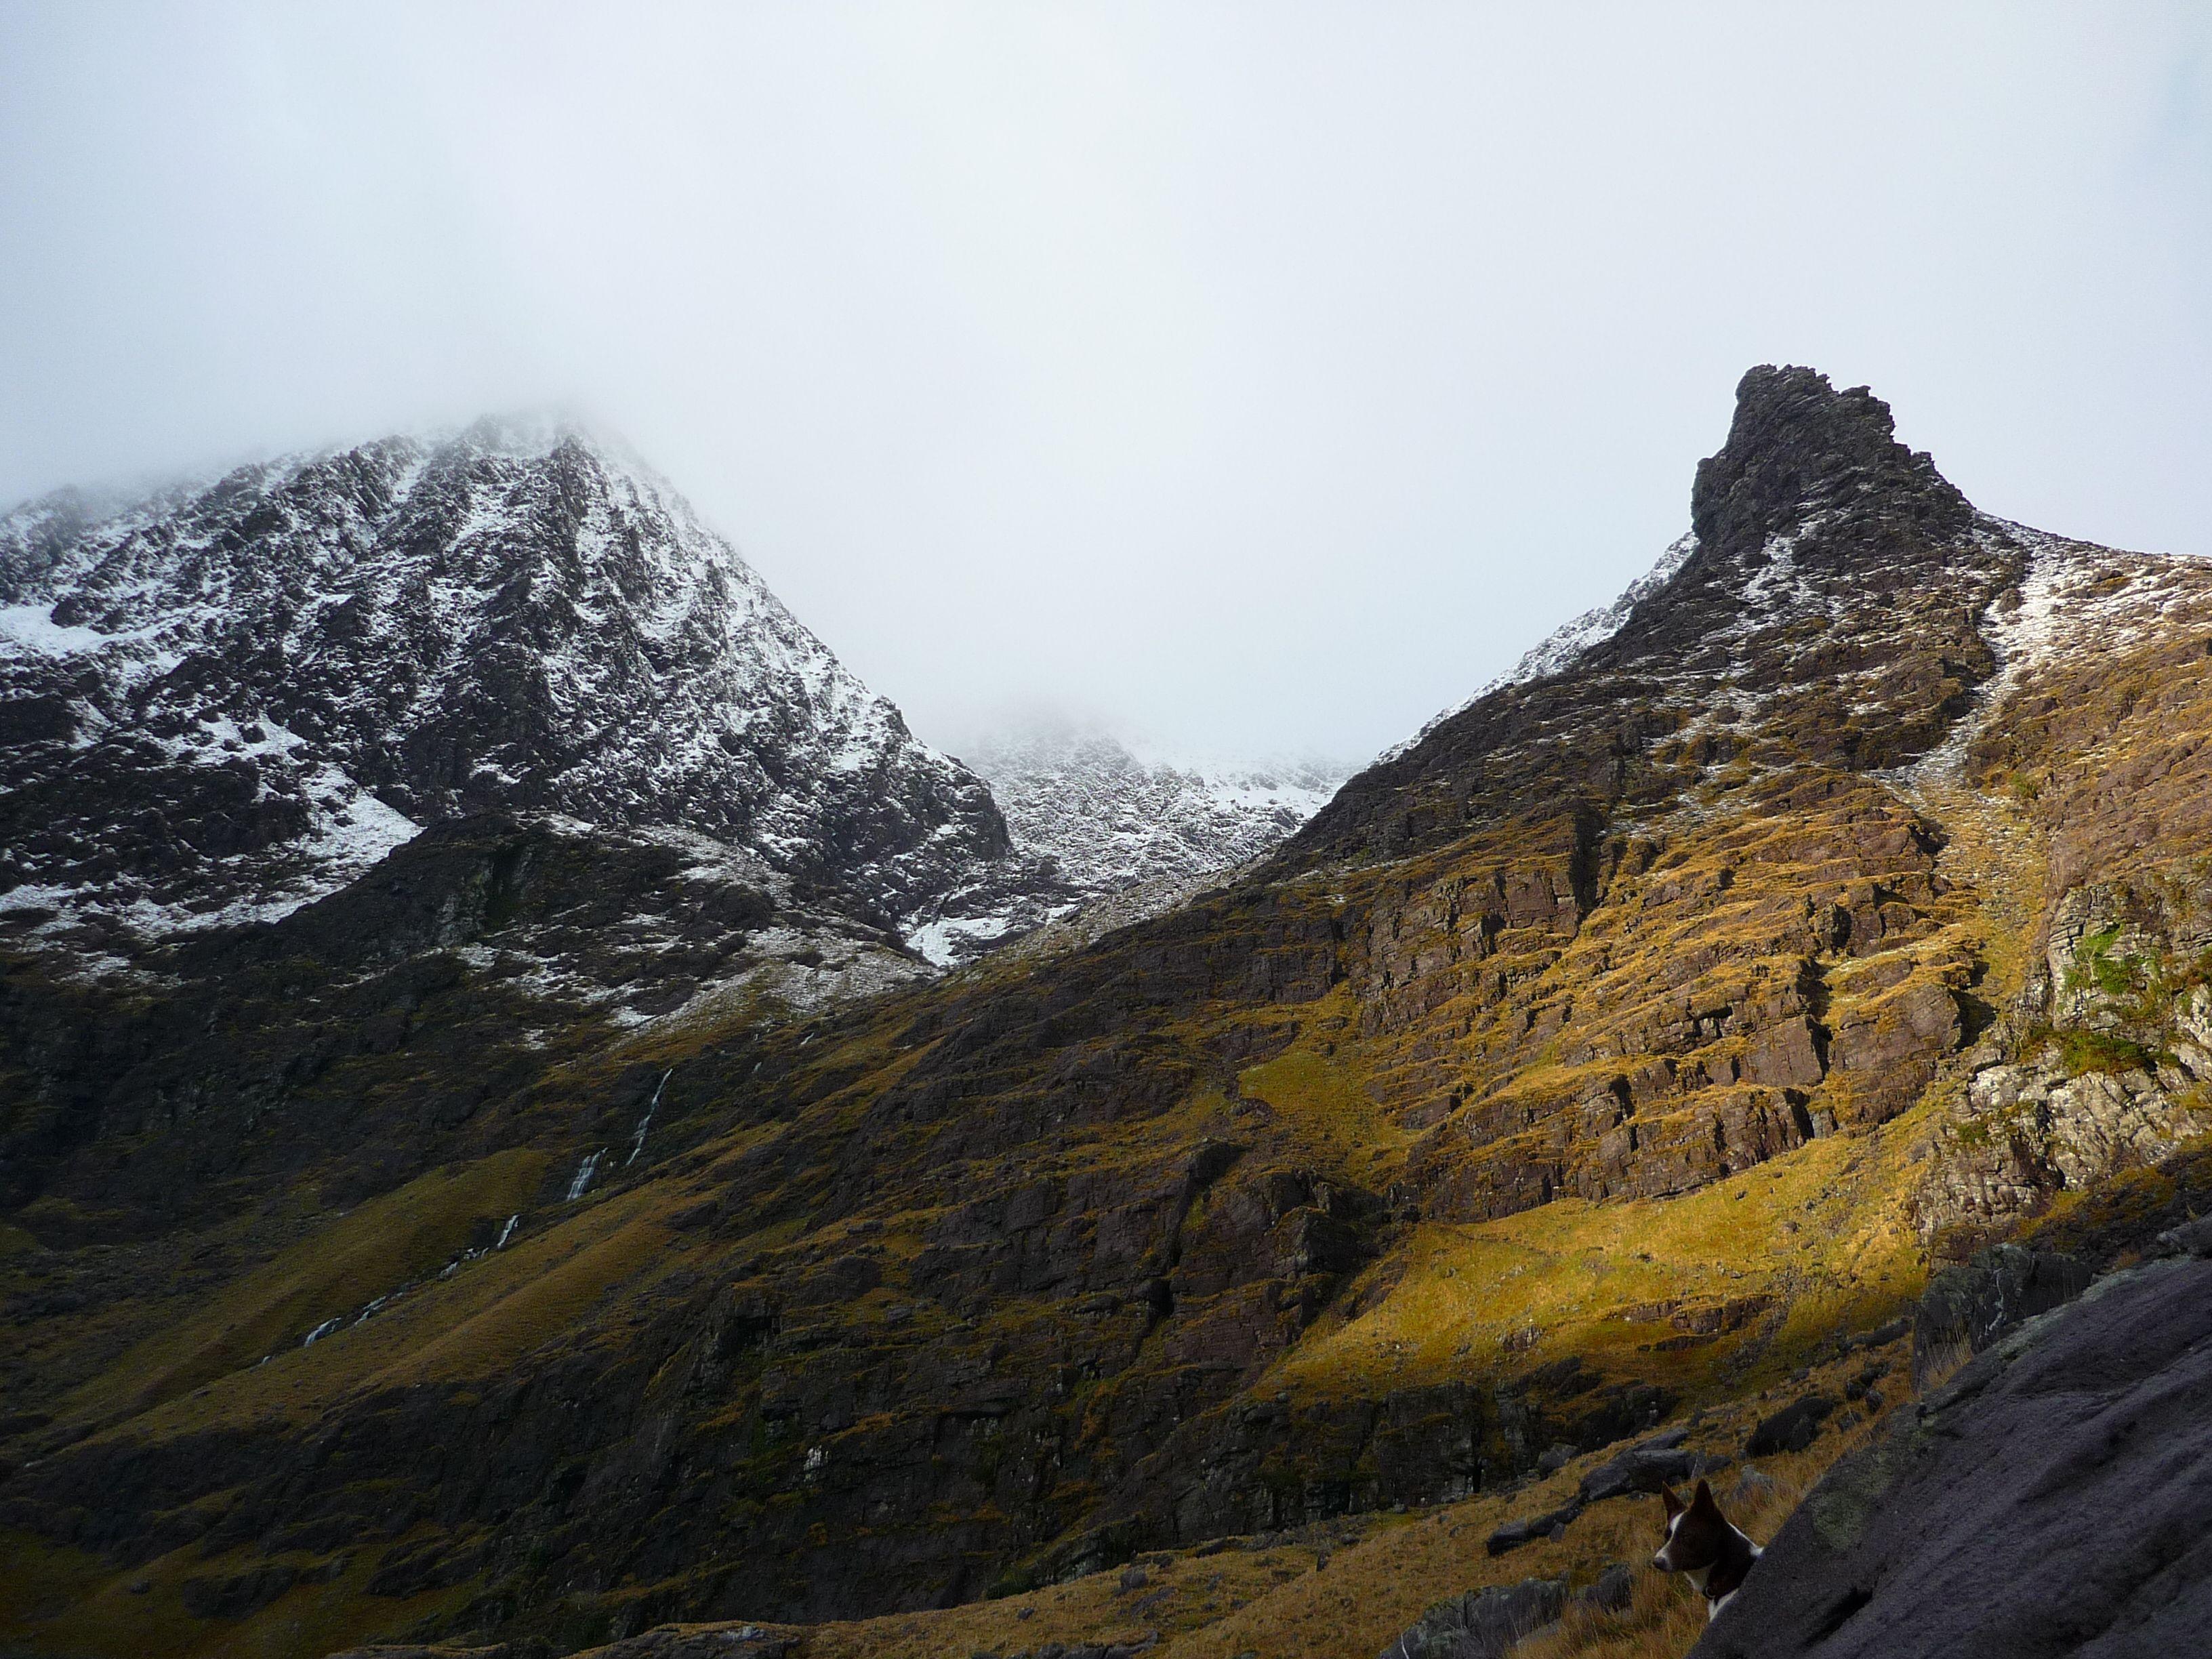 Right peak: Stumpa na Saimh (Stump of the Sorrel (sorrel: type of plant)) - Left peak: Carrauntoohil (Ireland's highest mountain - 1039m) - (Photo: Sean Fagan - Hag's Glen, Winter 2014).